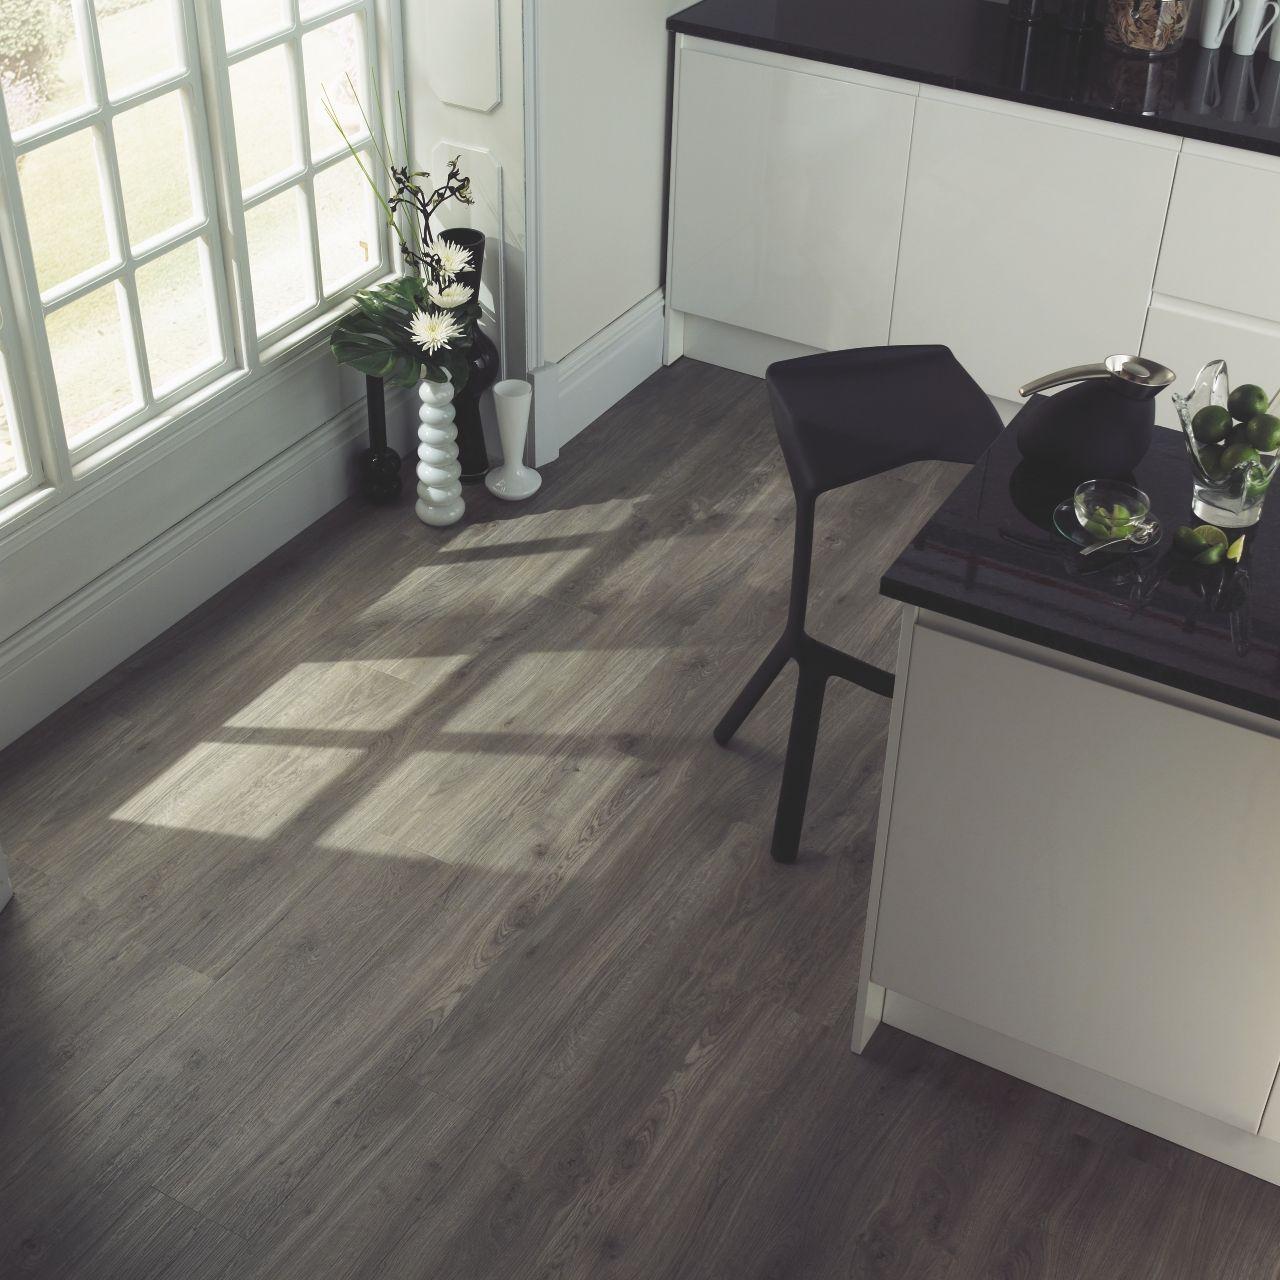 wood flooring weathered oak in a kitchen  amtico spacia weathered oak  www amtico com   flooring   pinterest      rh   pinterest com